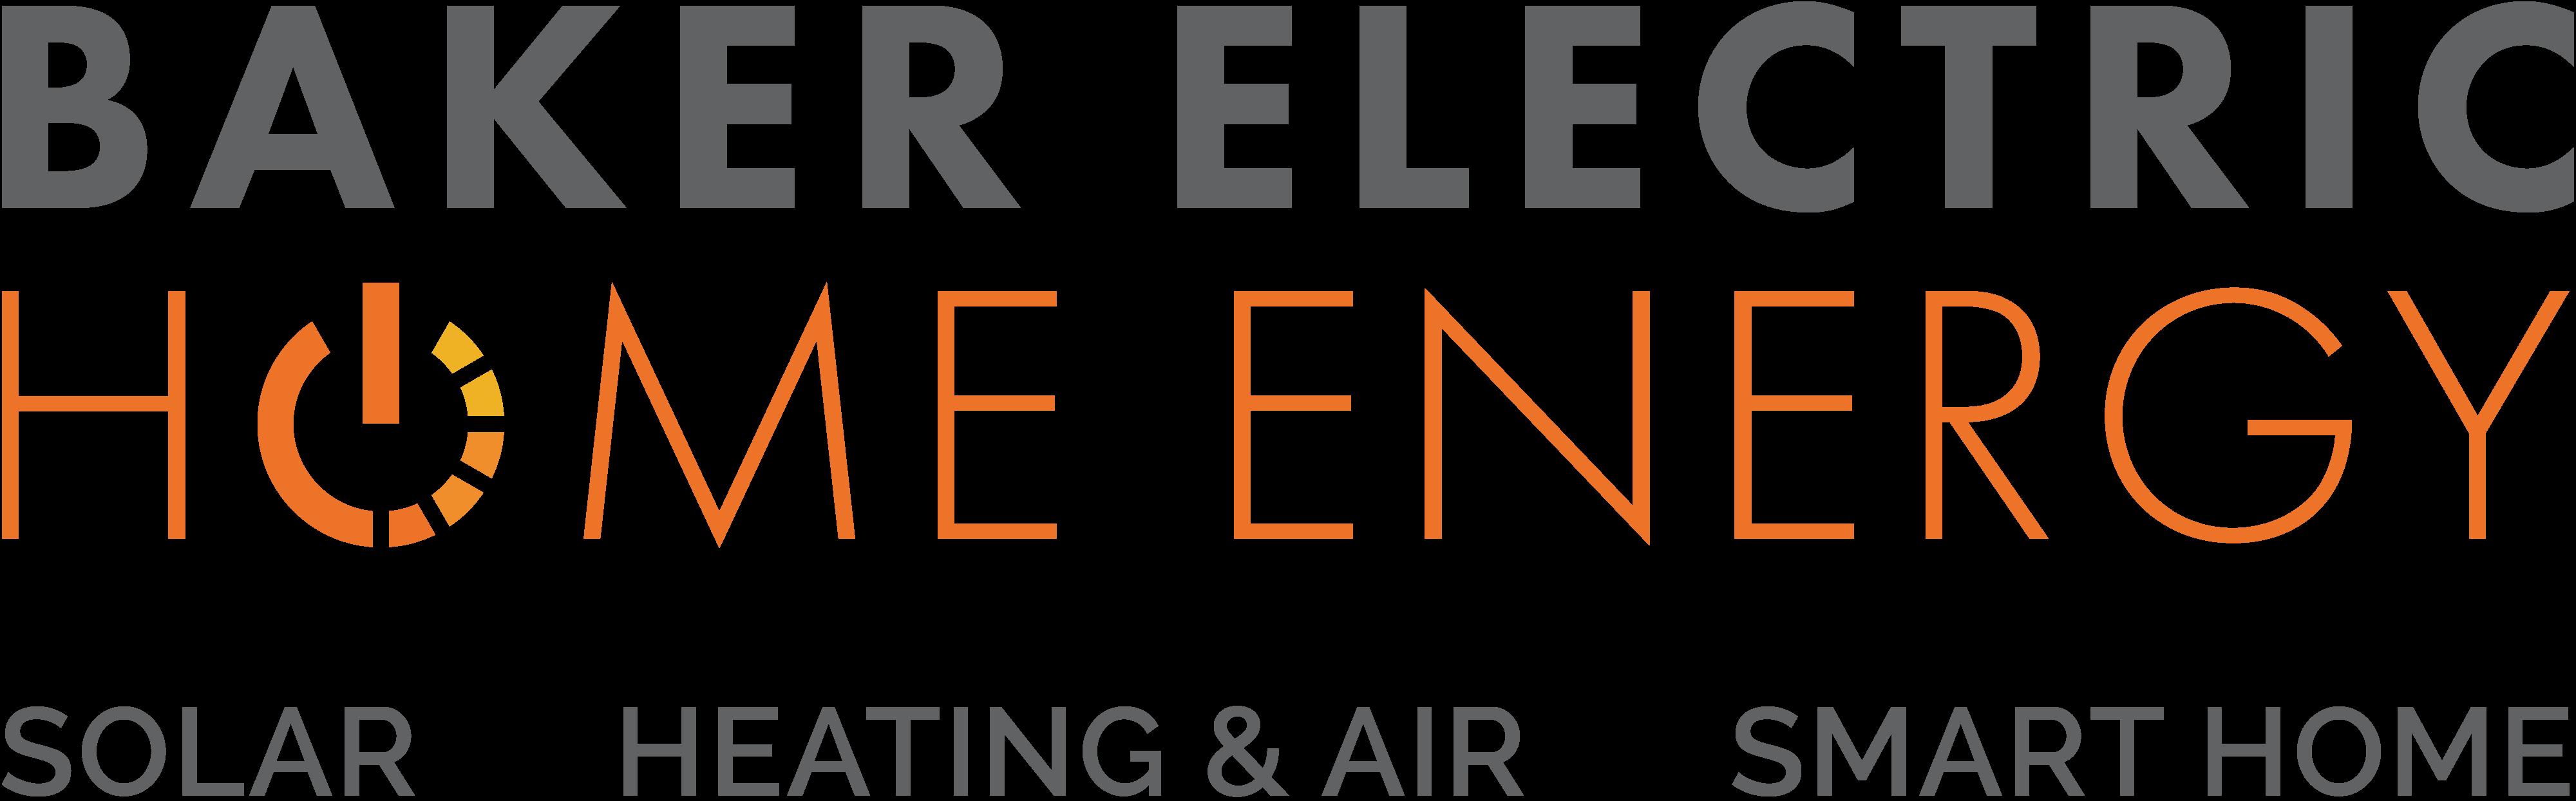 Baker Electric Solar >> Baker Electric Home Energy Reviews Escondido Ca Angie S